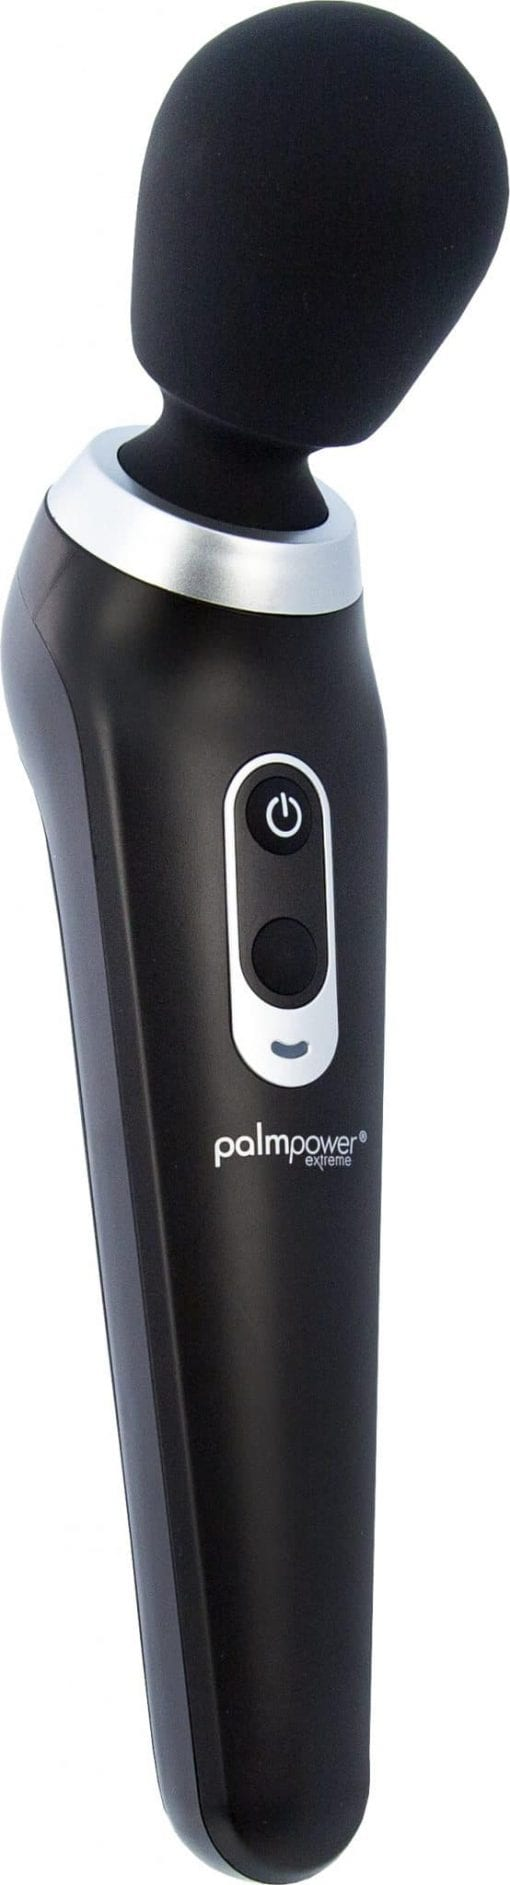 PalmPower Extreme Black